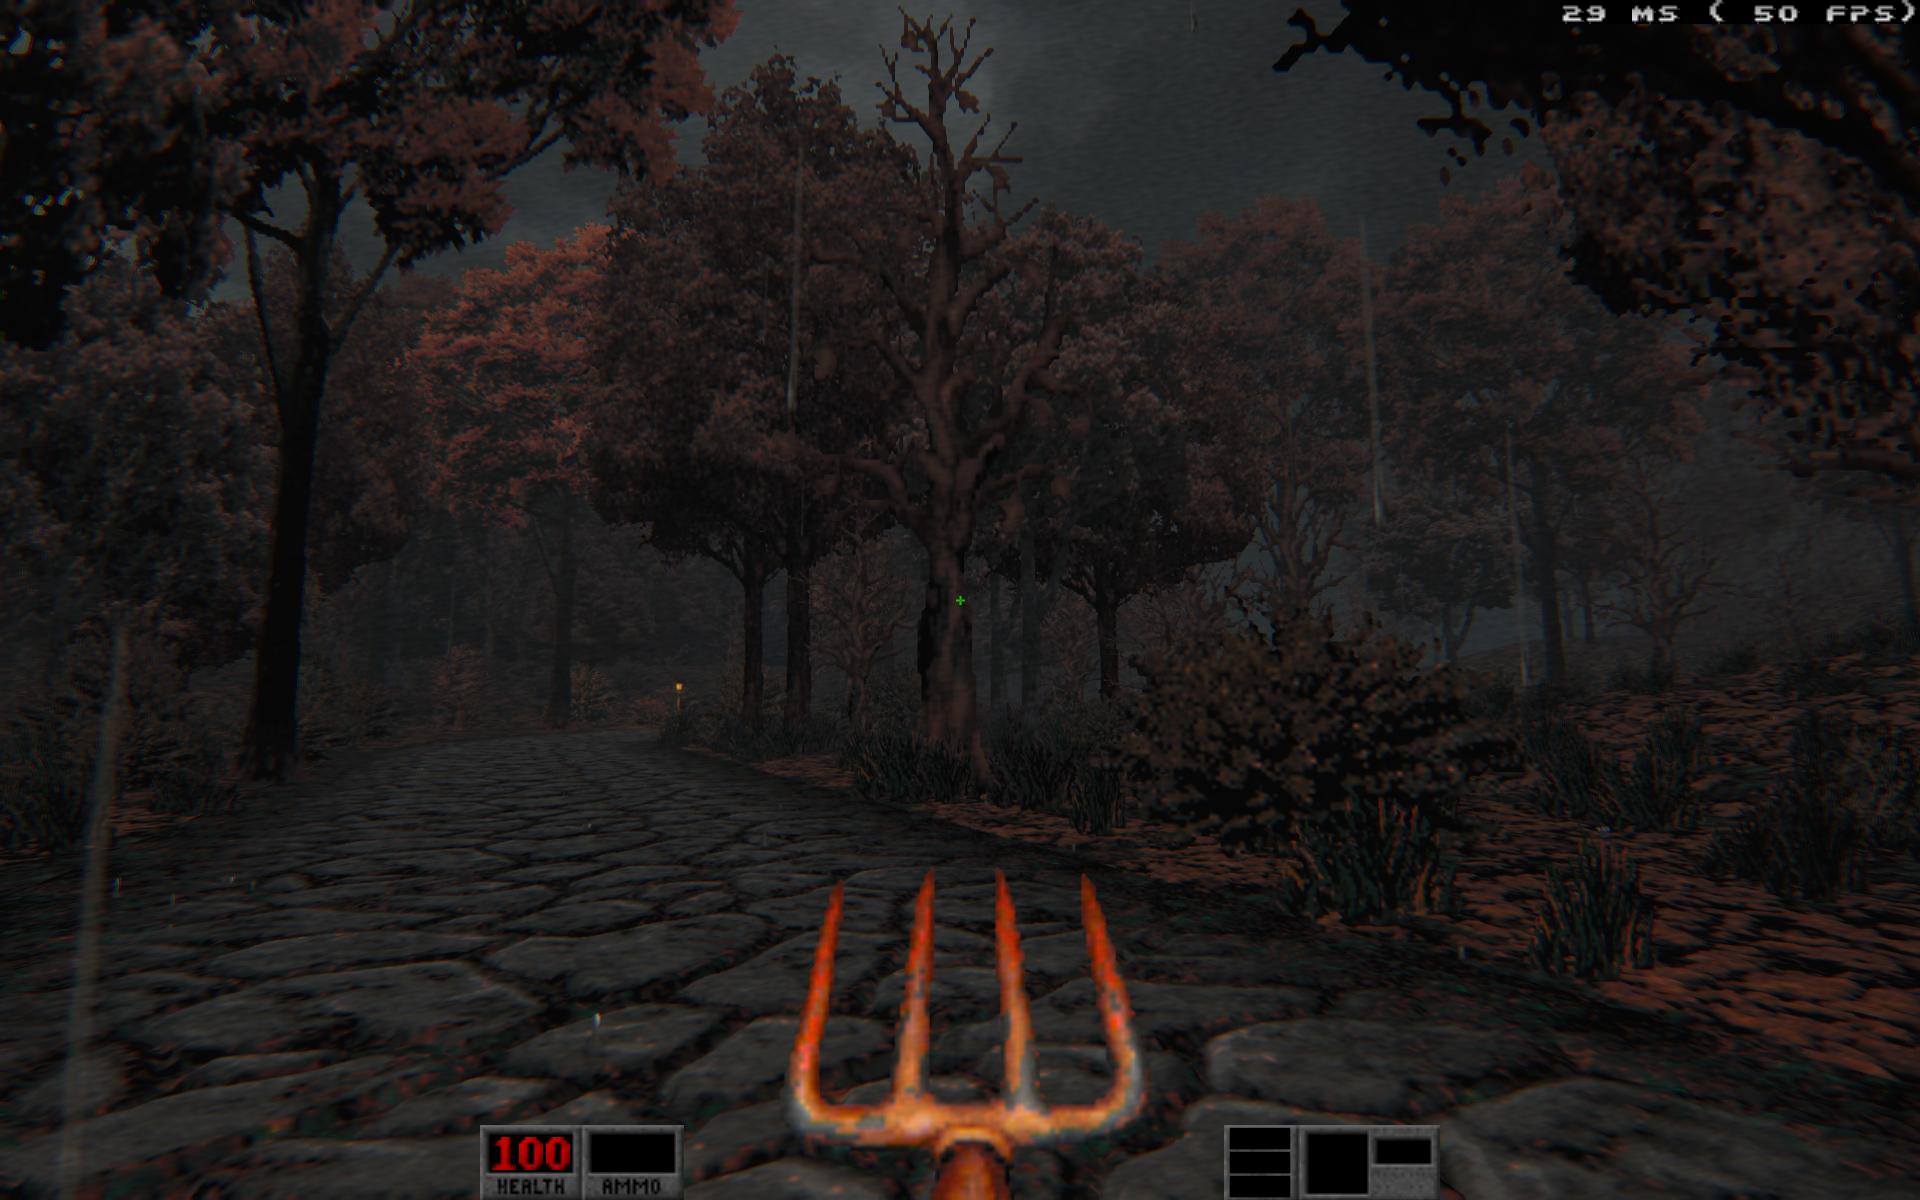 Screenshot_Doom_20181126_205257.png.9868d99c22e16ecd9f66542c3baadf0b.png